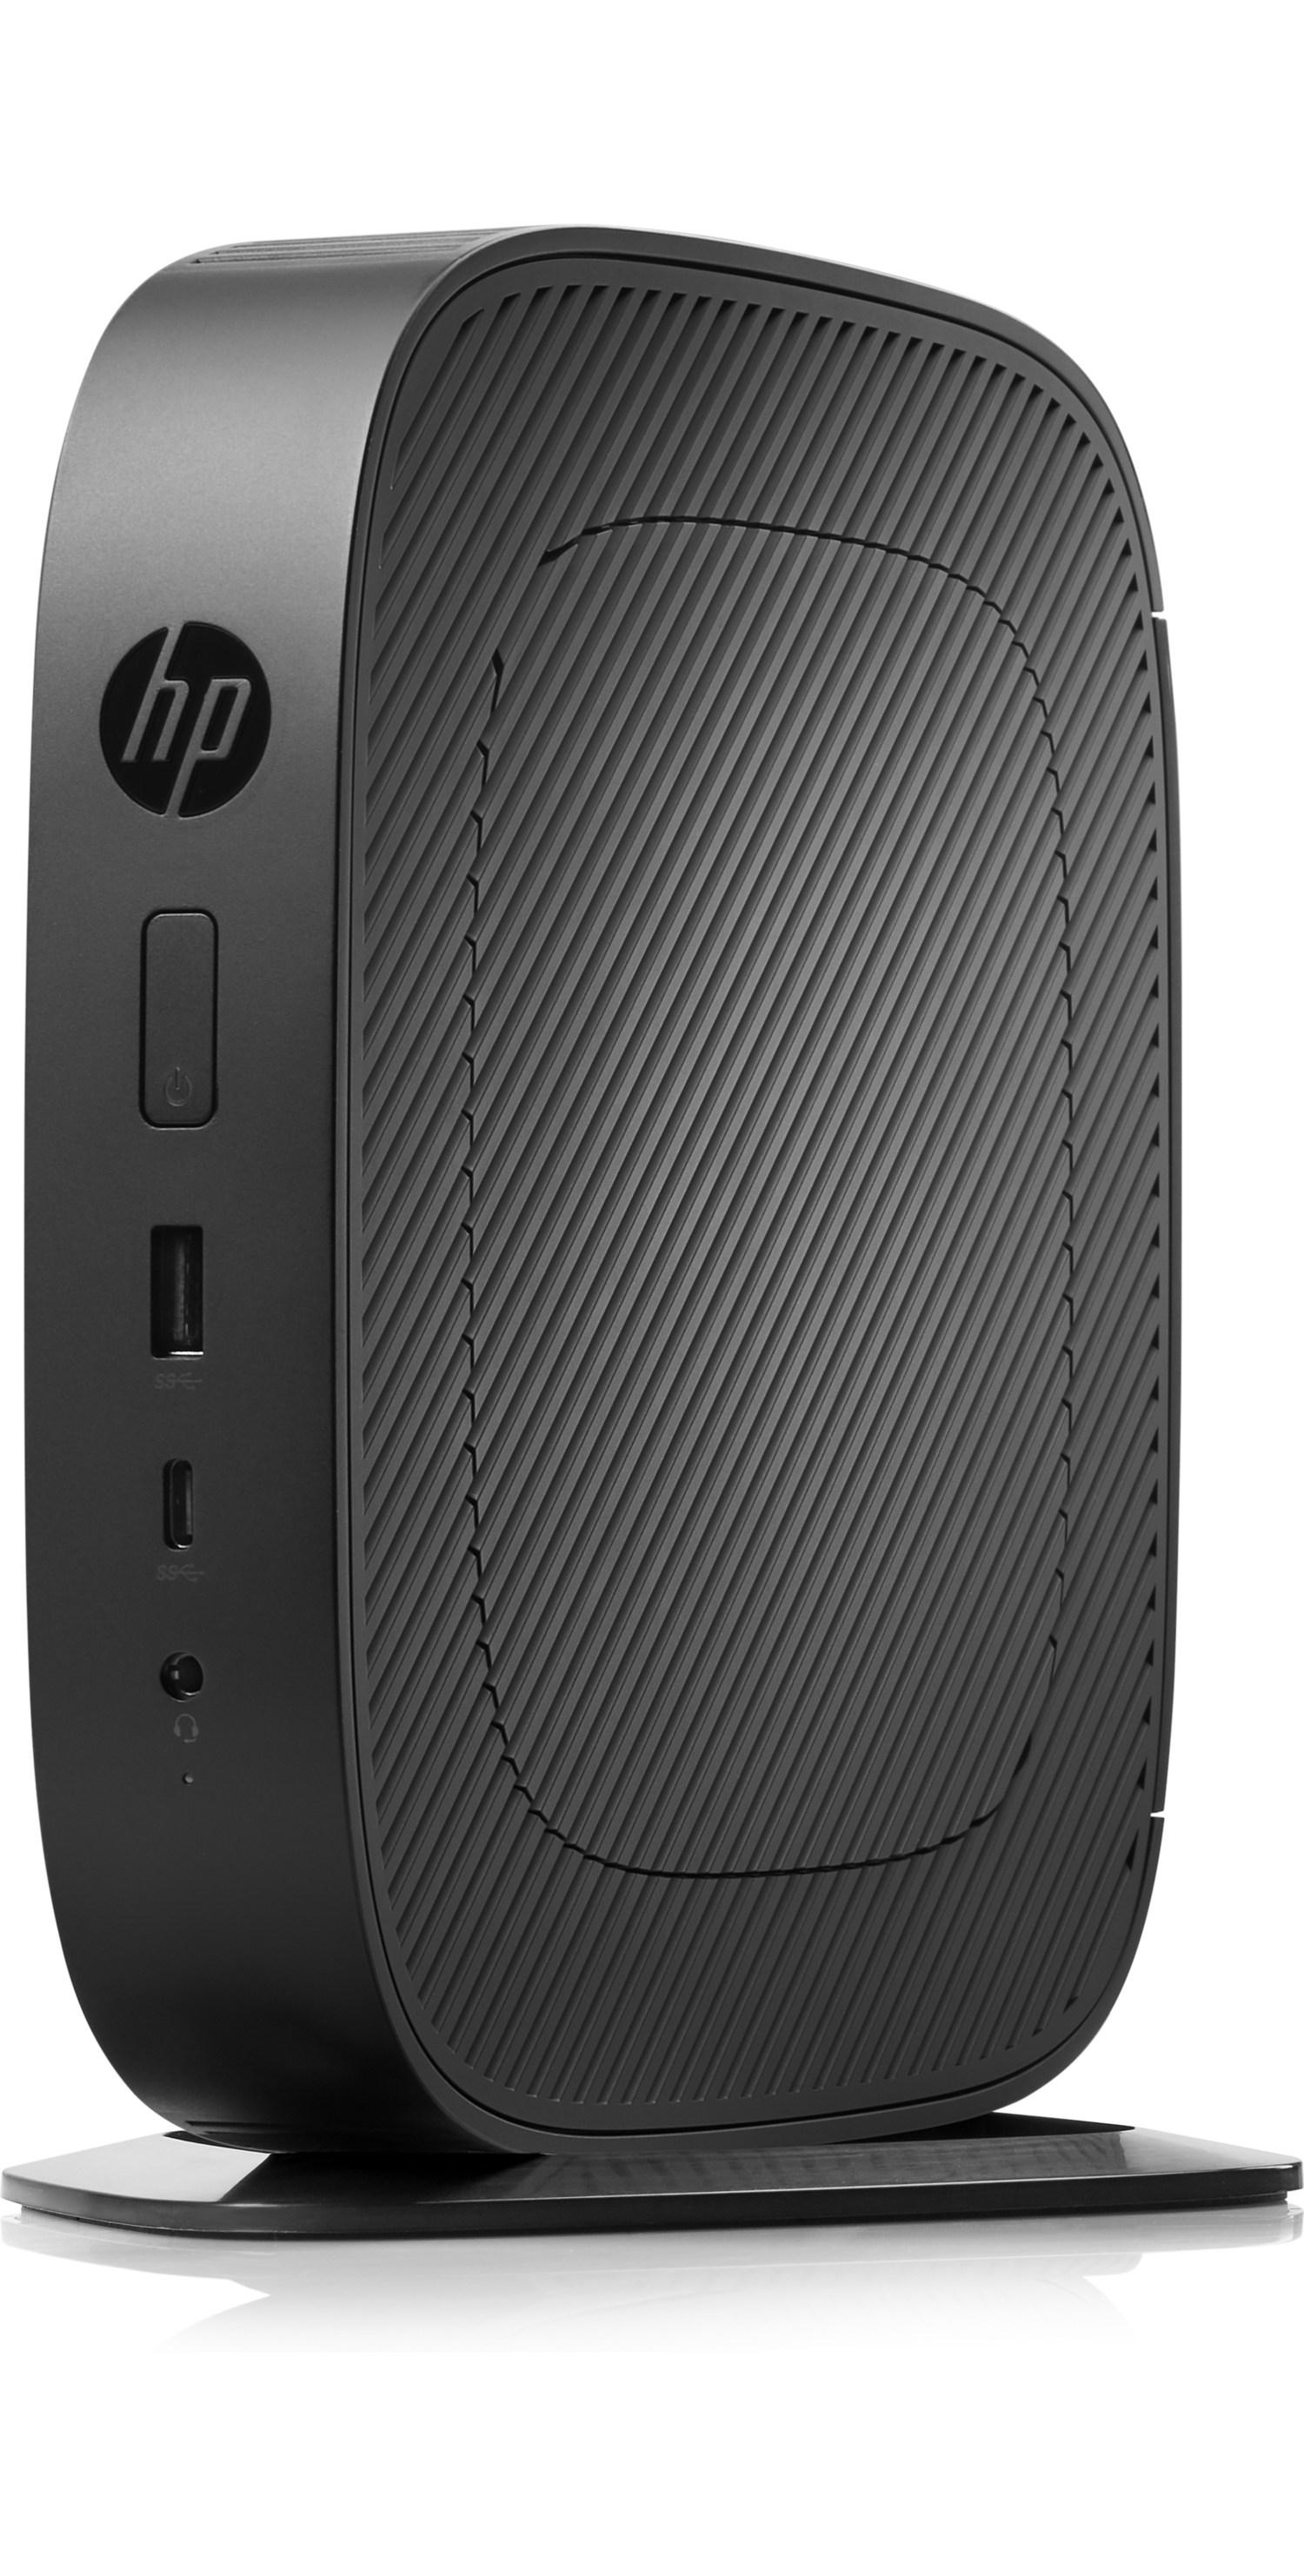 Hewlett-Packard, T530, AMD, GX-215J, 4G, 32G, W10, IOT, DG-WES7E,